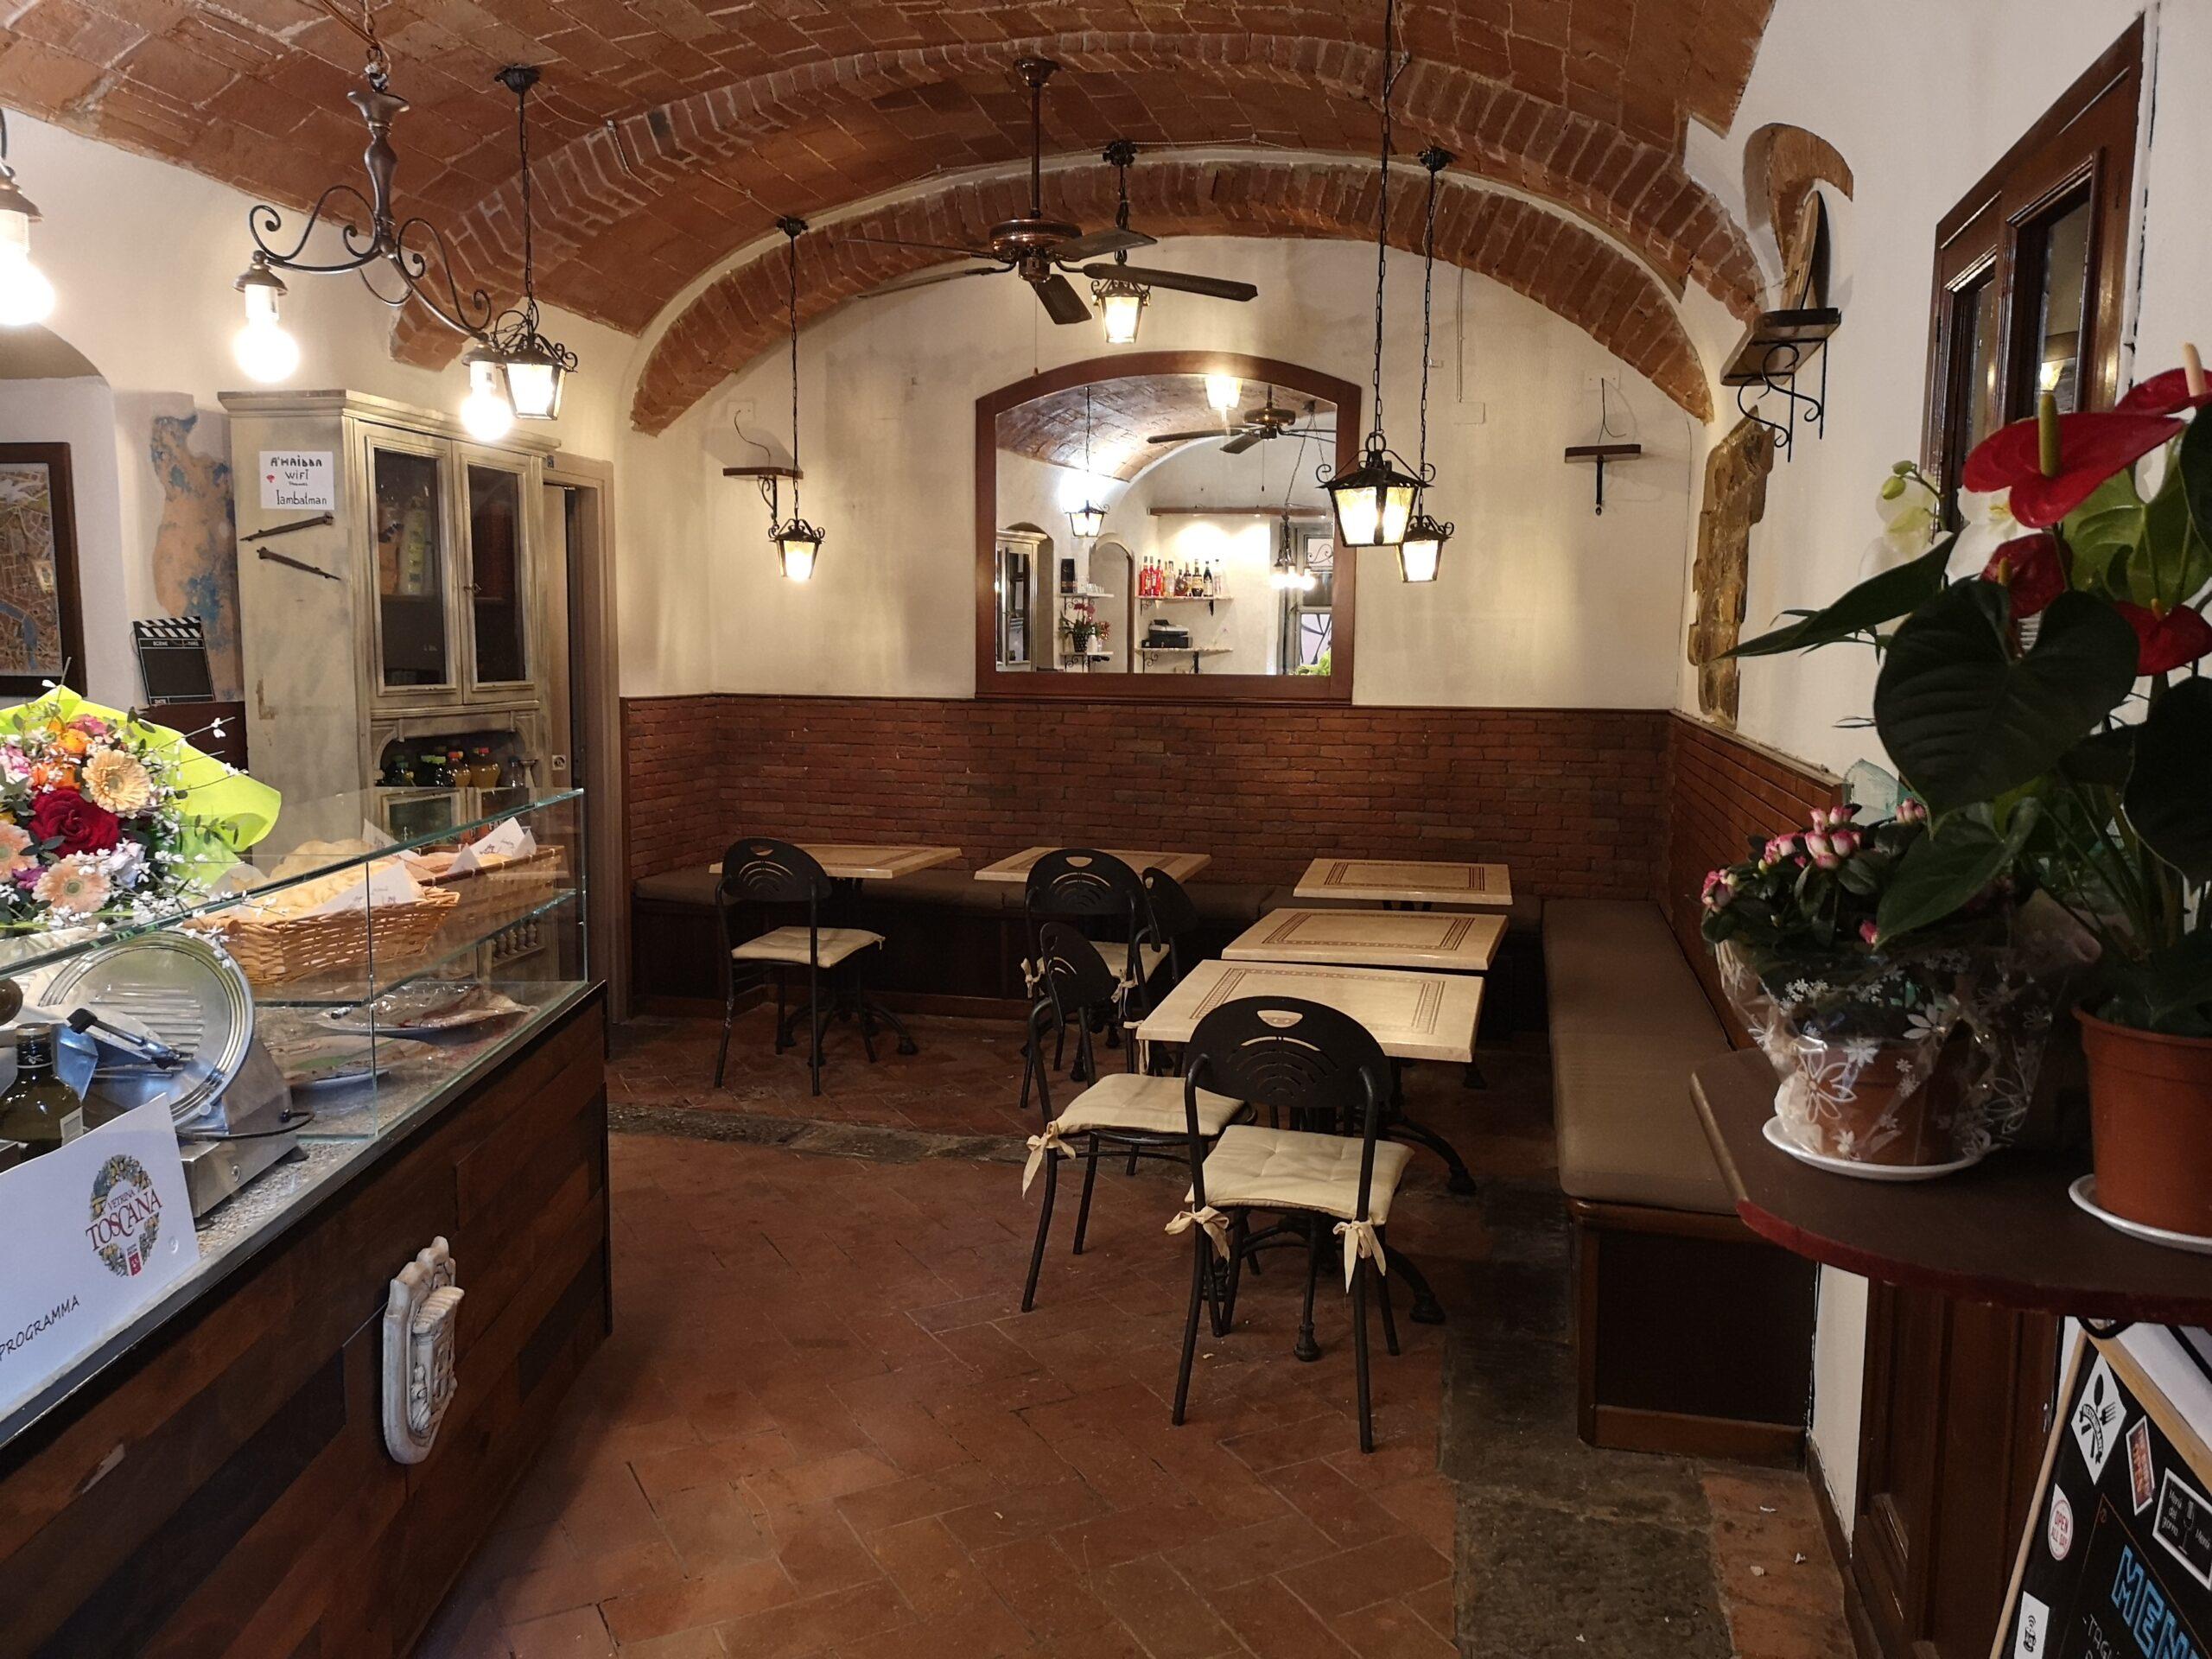 BONA DEA CAFE' BISTRO'